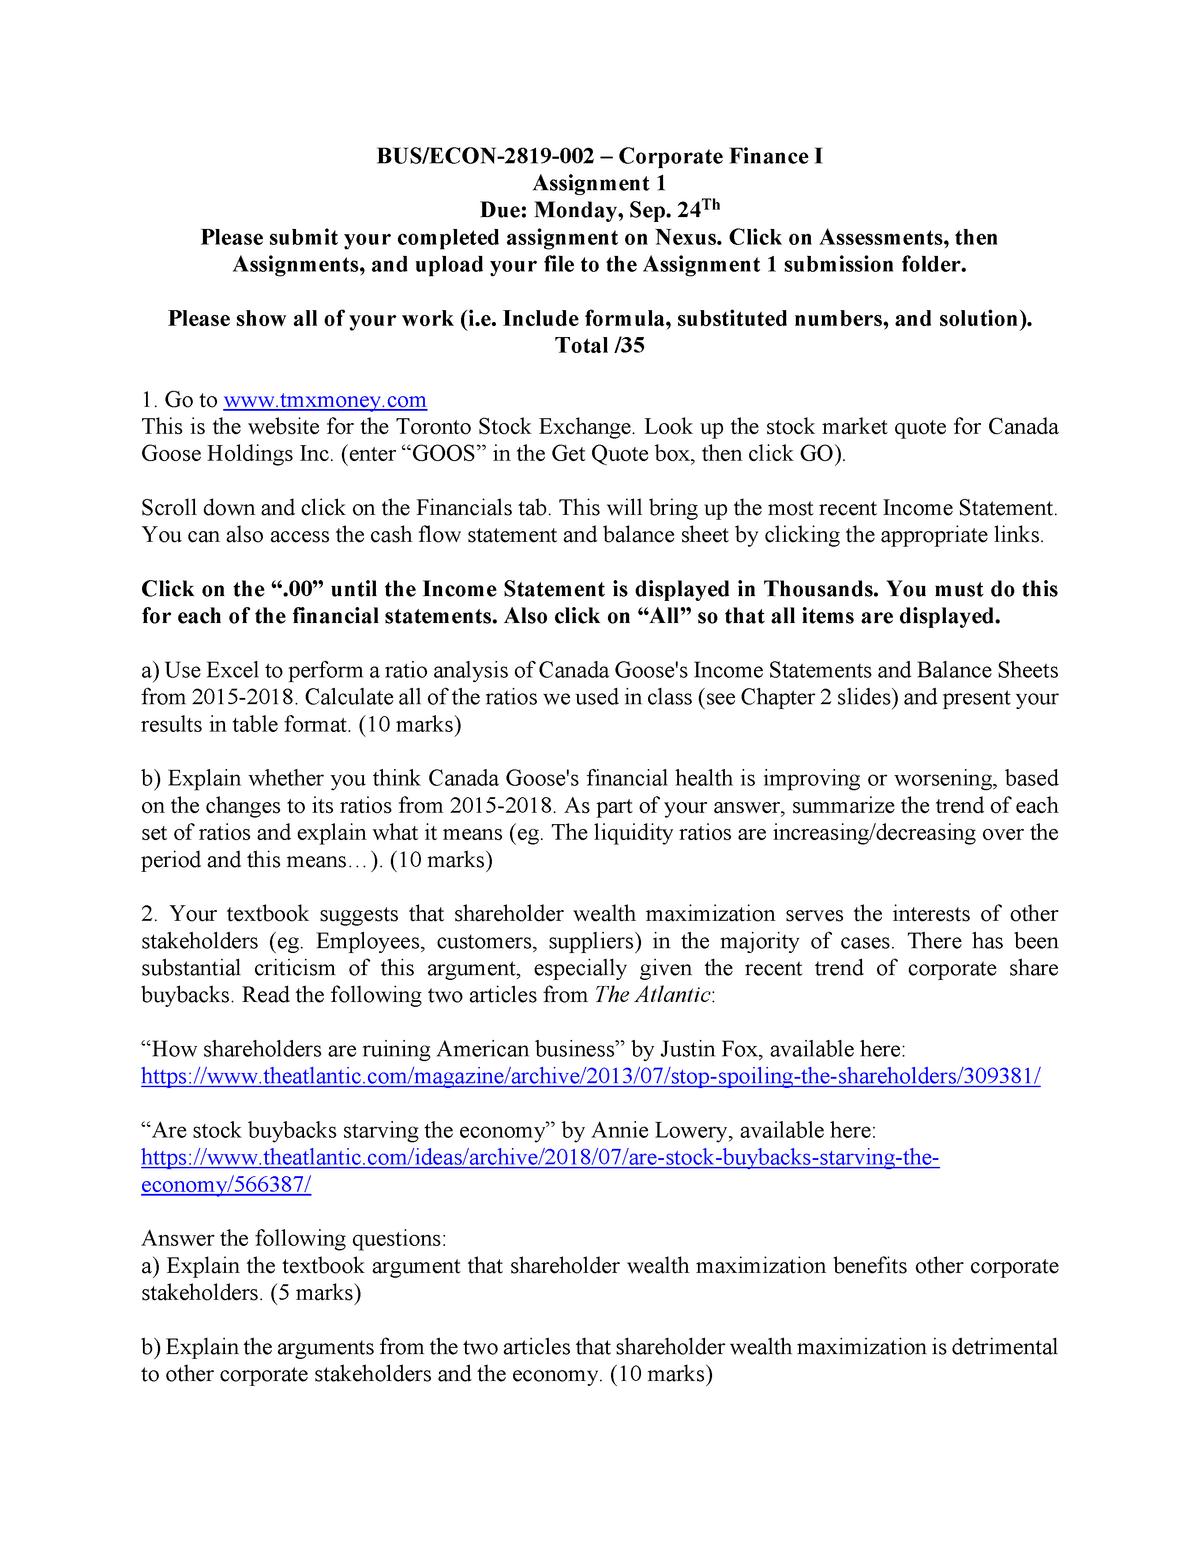 Corporate Finance Assignment 1 - ECON-2819 - U of W - StuDocu